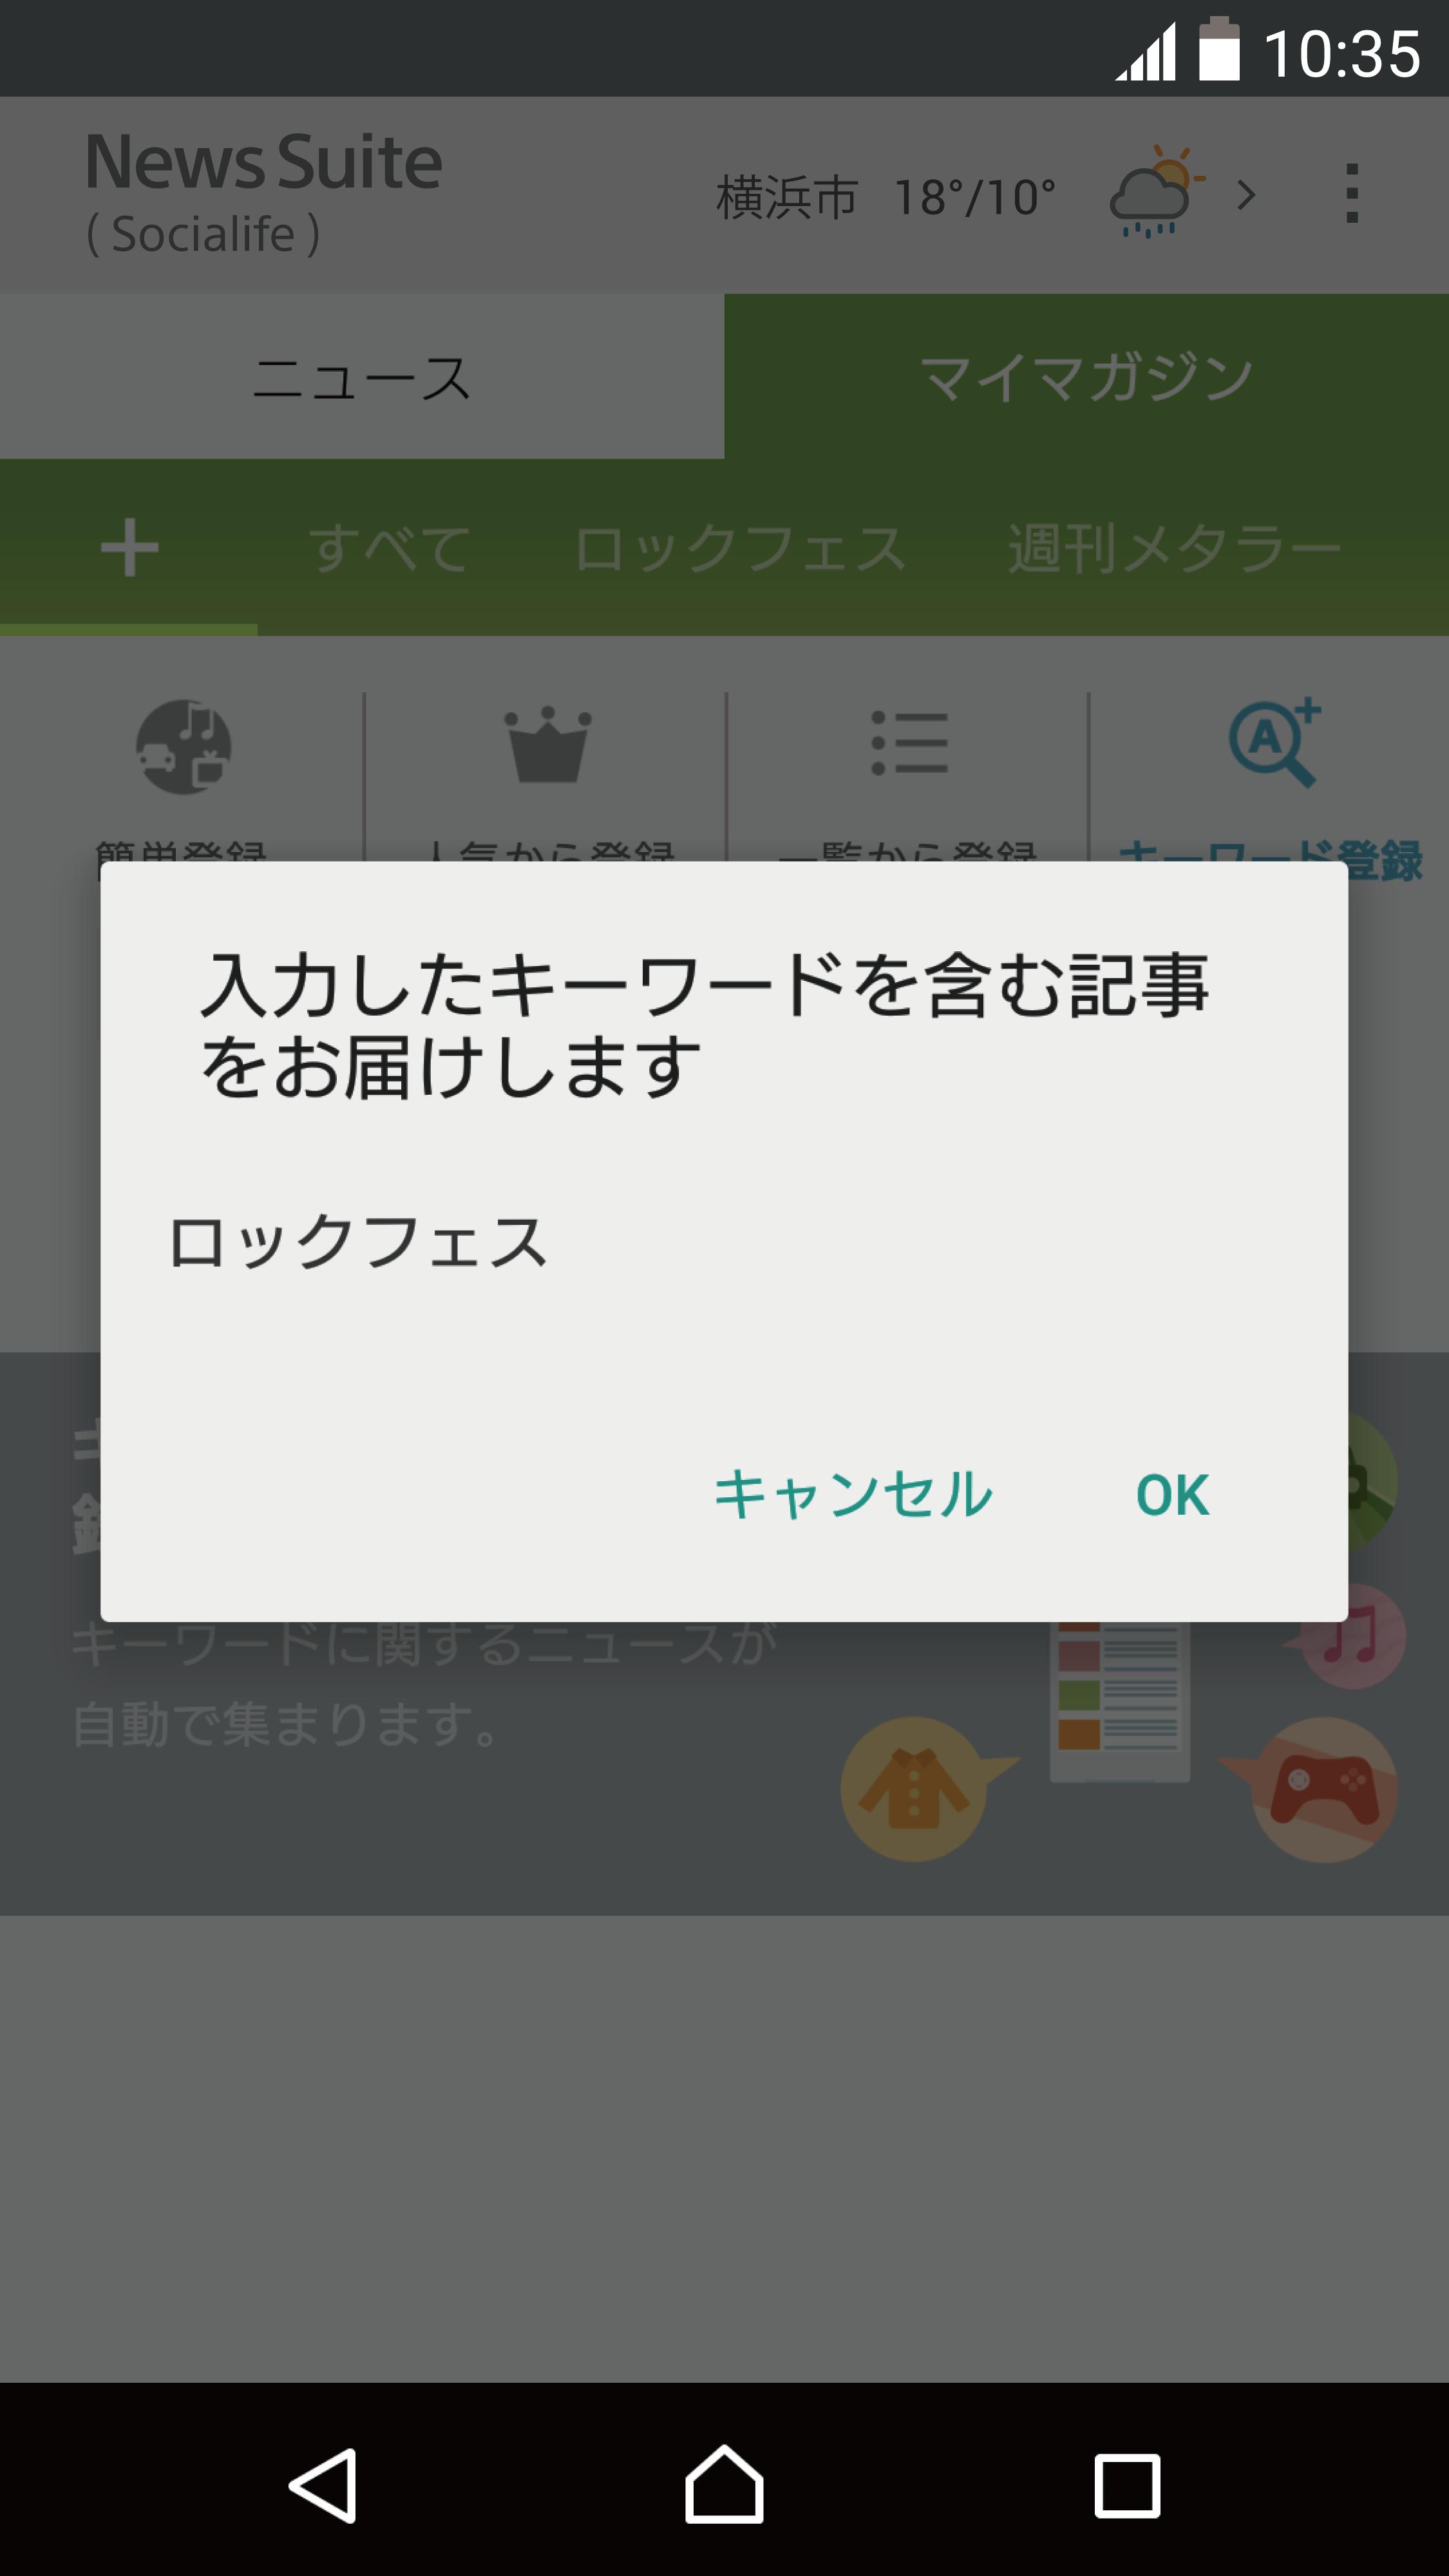 Sony|ソニー ニュースアプリ「New Suite(ニューススイート)」